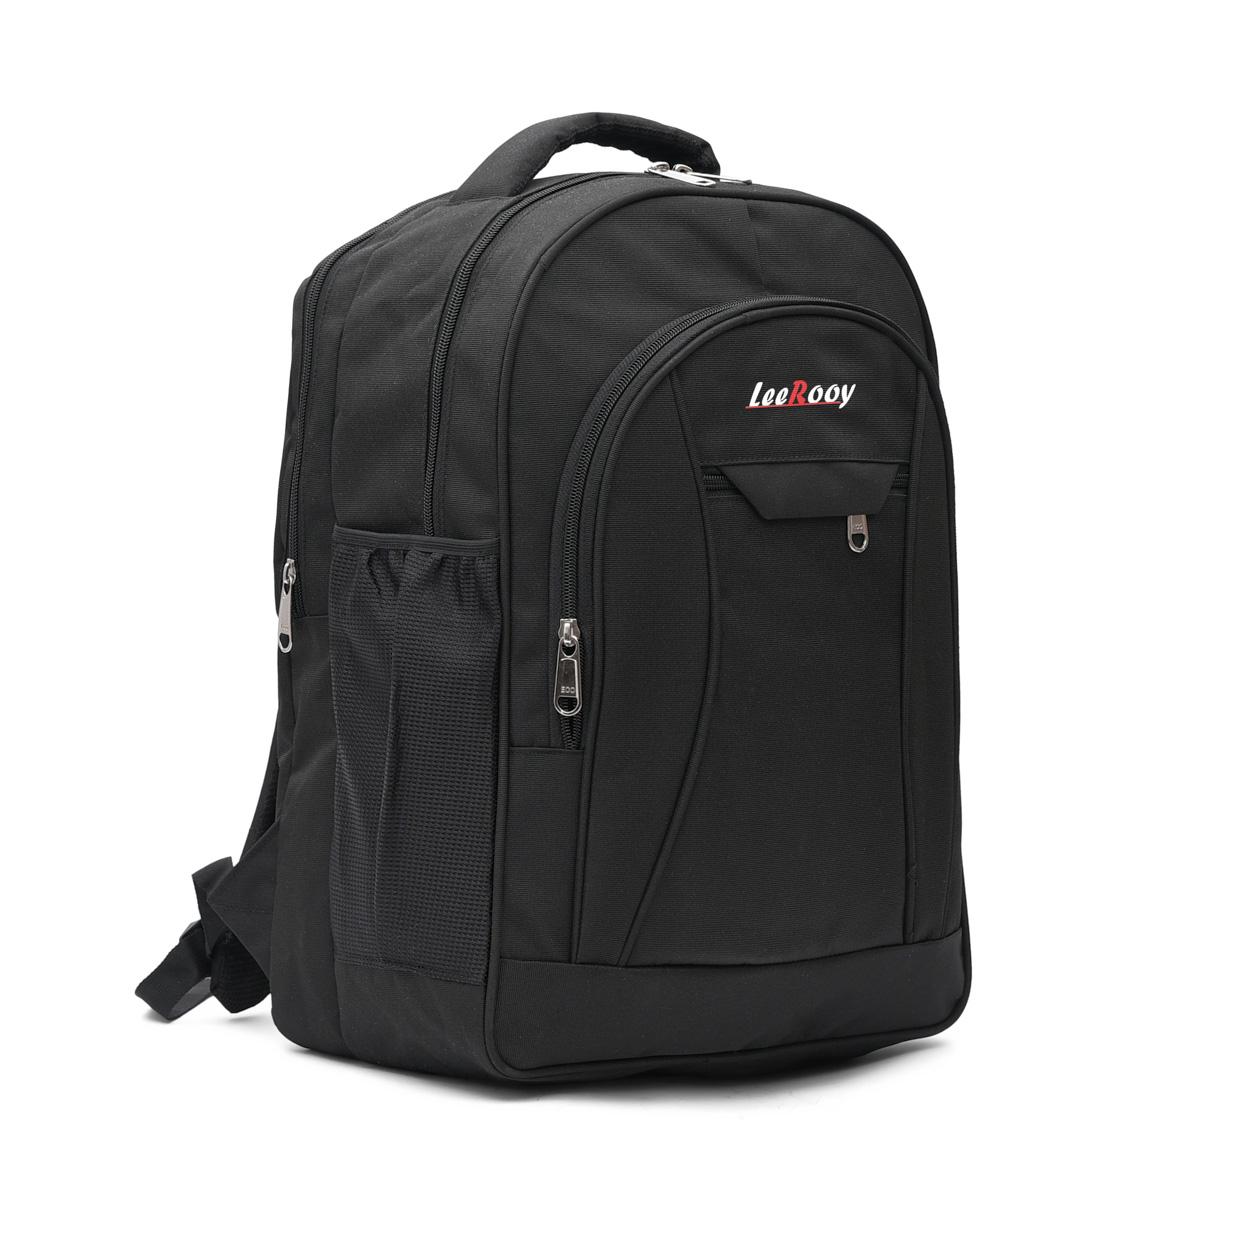 Leerooy Bag03Black Ni14606 Waterproof Multipurpose Bag  Black, Black, 39 L  School/Colleg Bag Laptop Bag